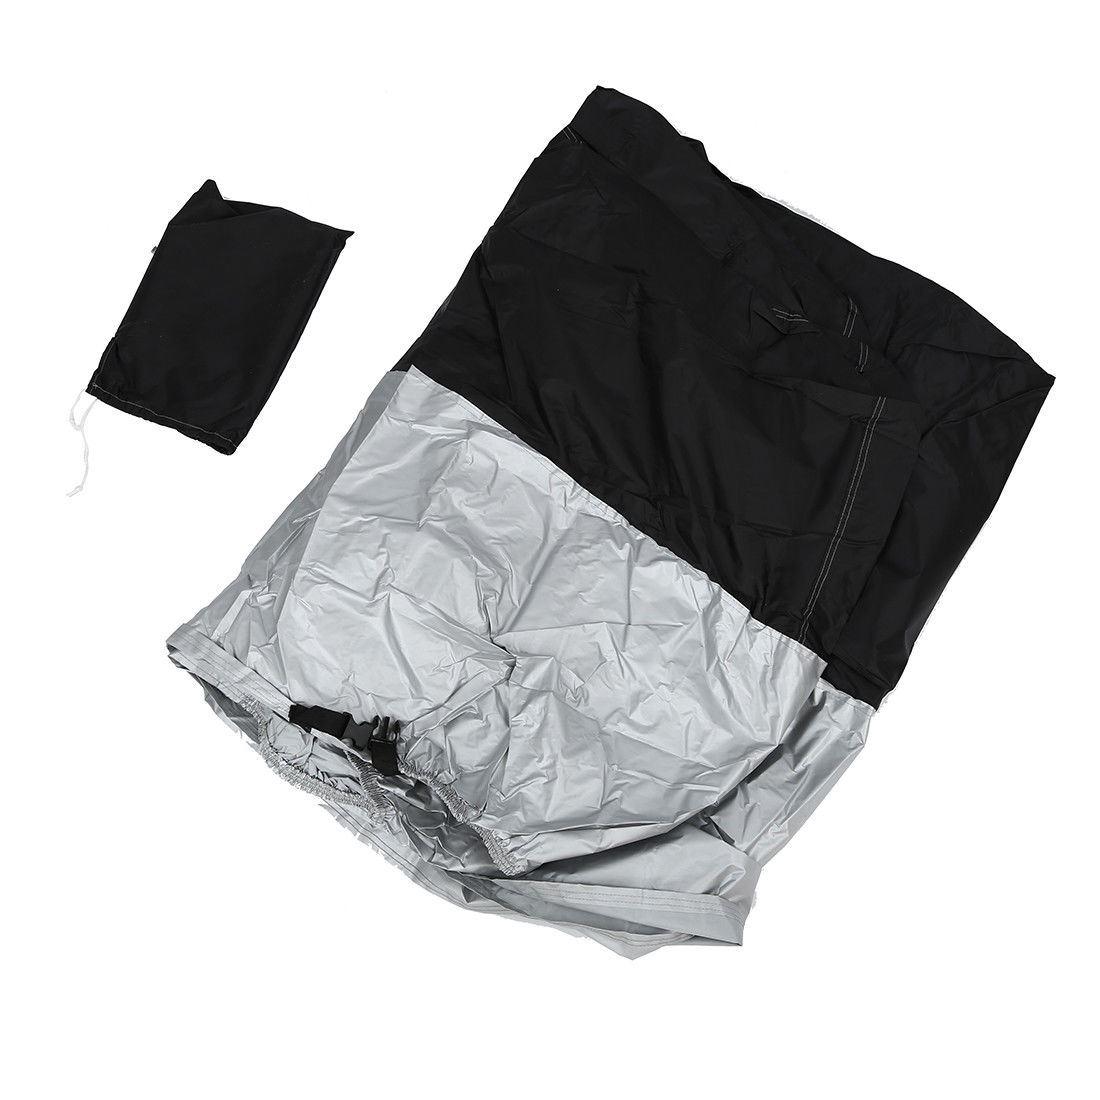 Funda-Impermeable-Protectora-Cubre-Moto-Cosida-Muy-Resistente-Tallas-M-XXL miniatura 10